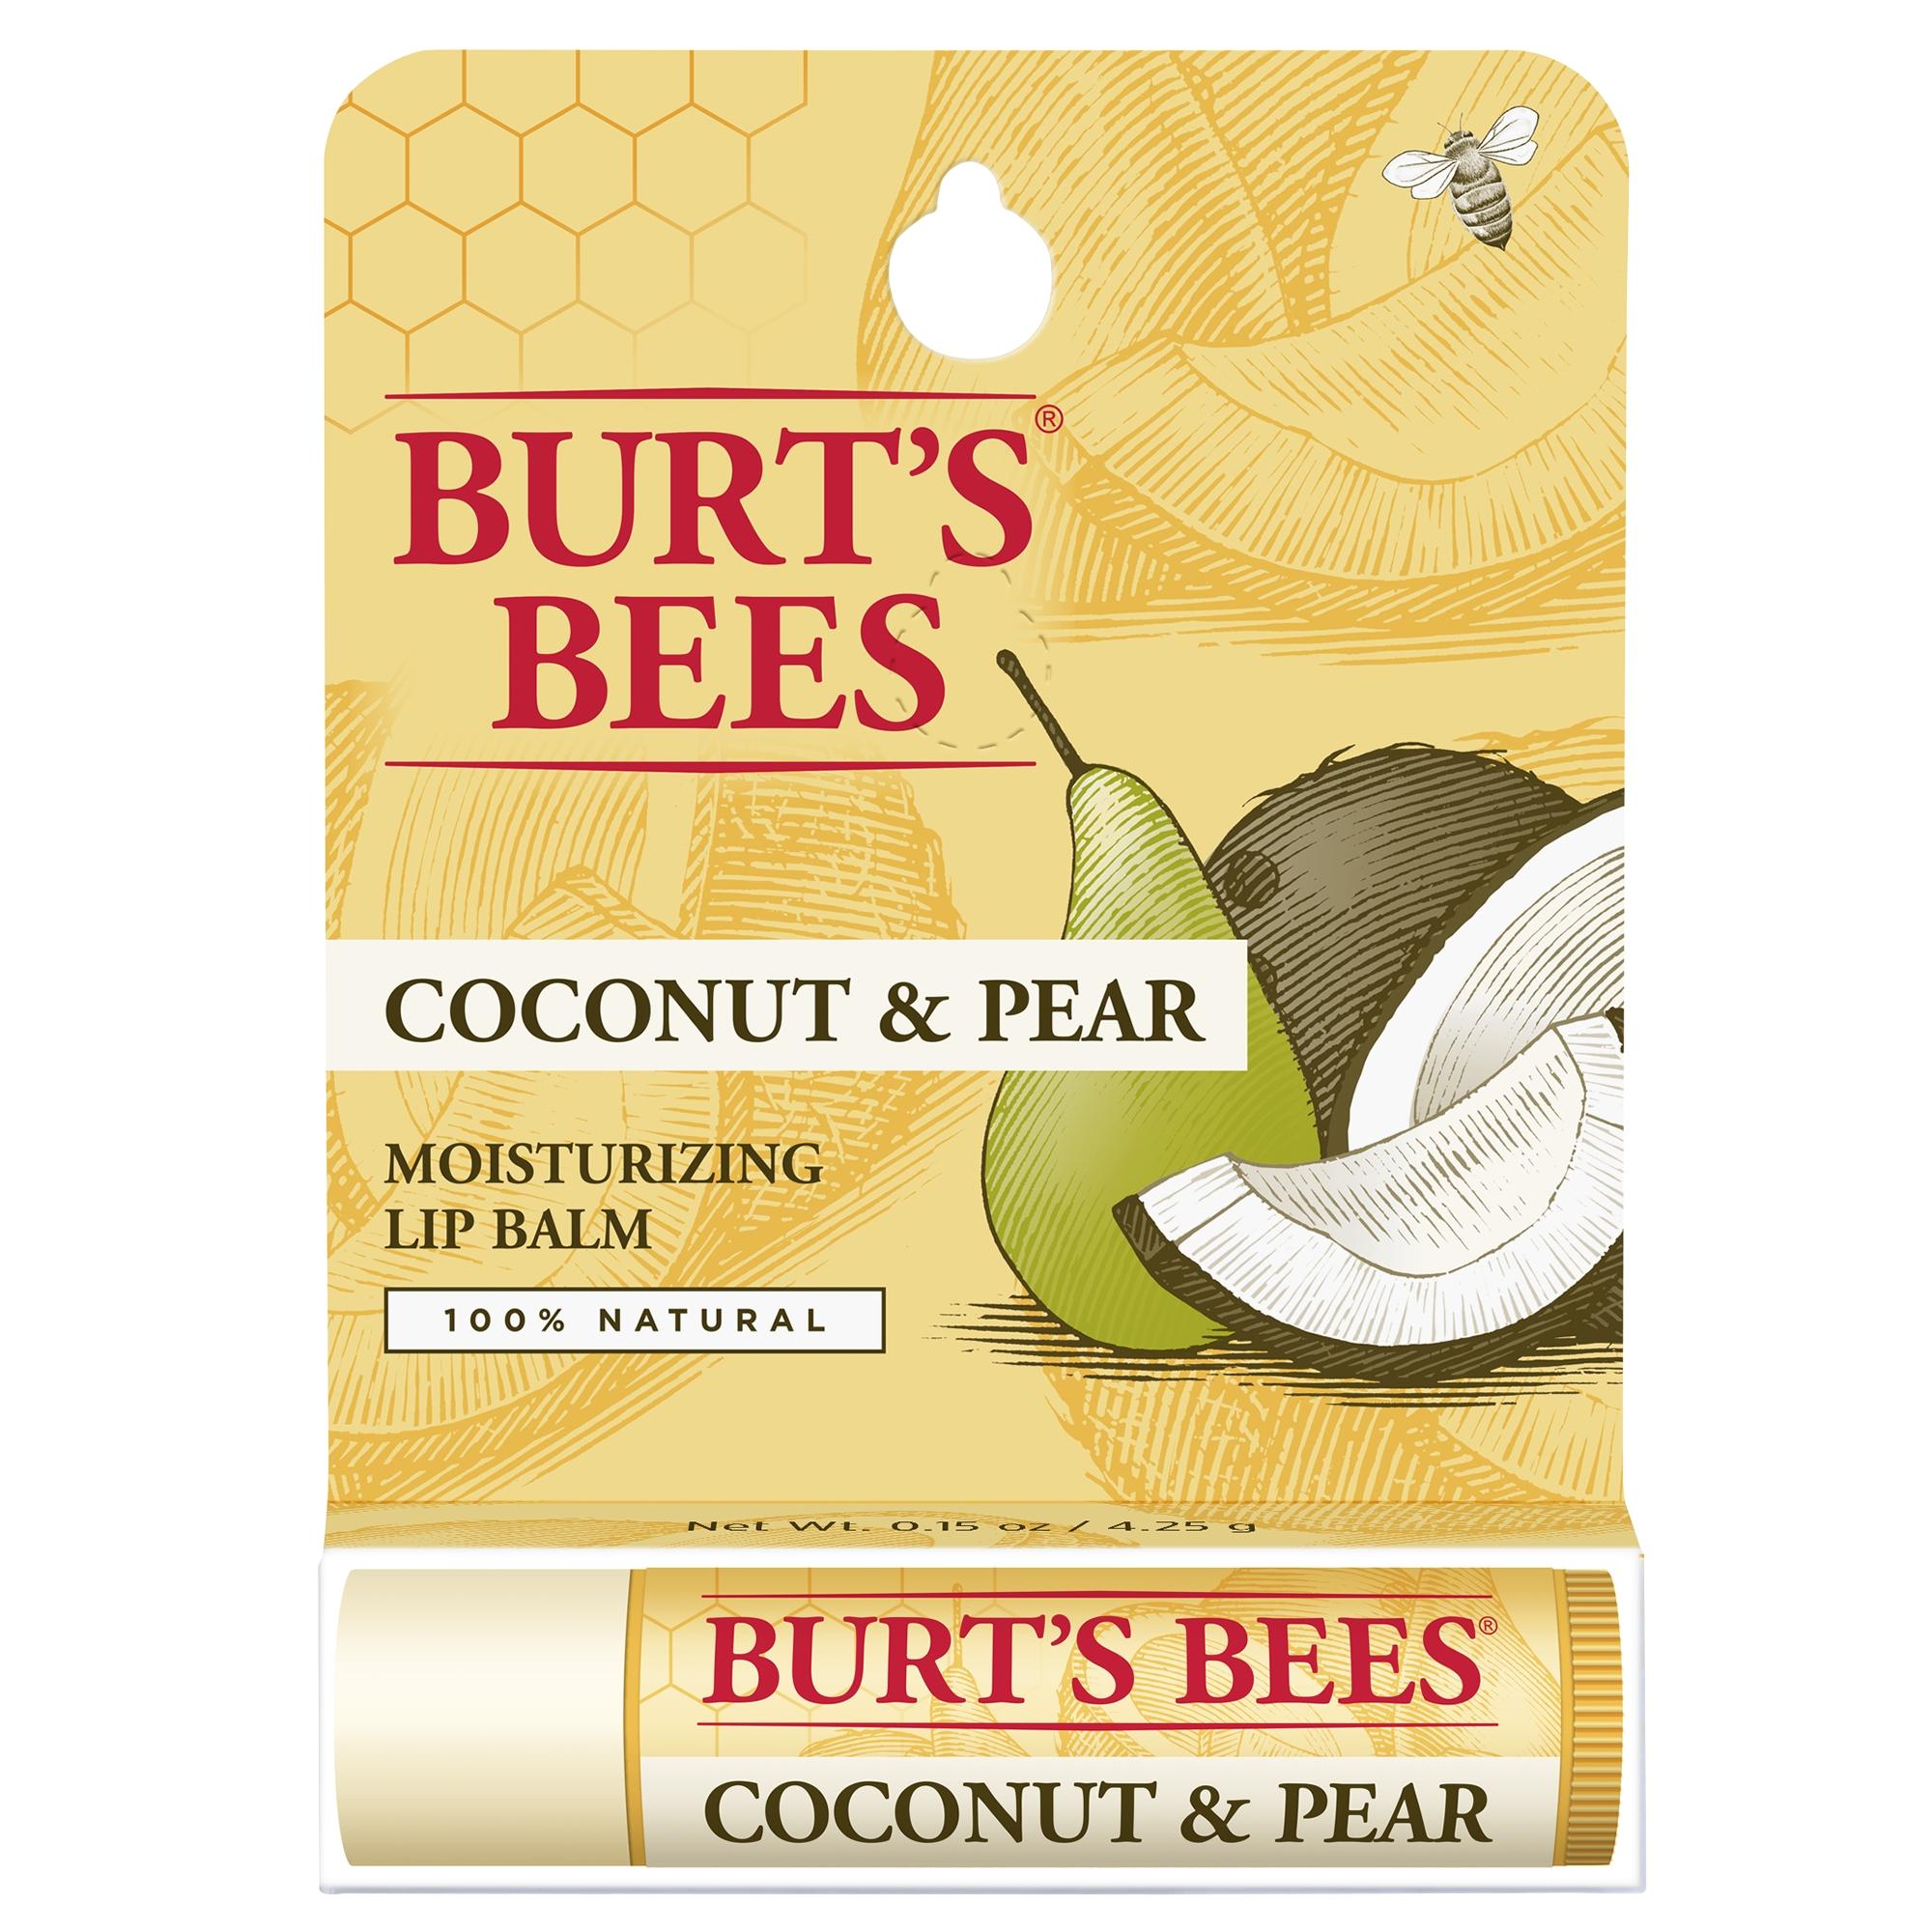 Burt's bees 100% natural moisturizing lip balm, coconut & pear, 1 tube in blister box